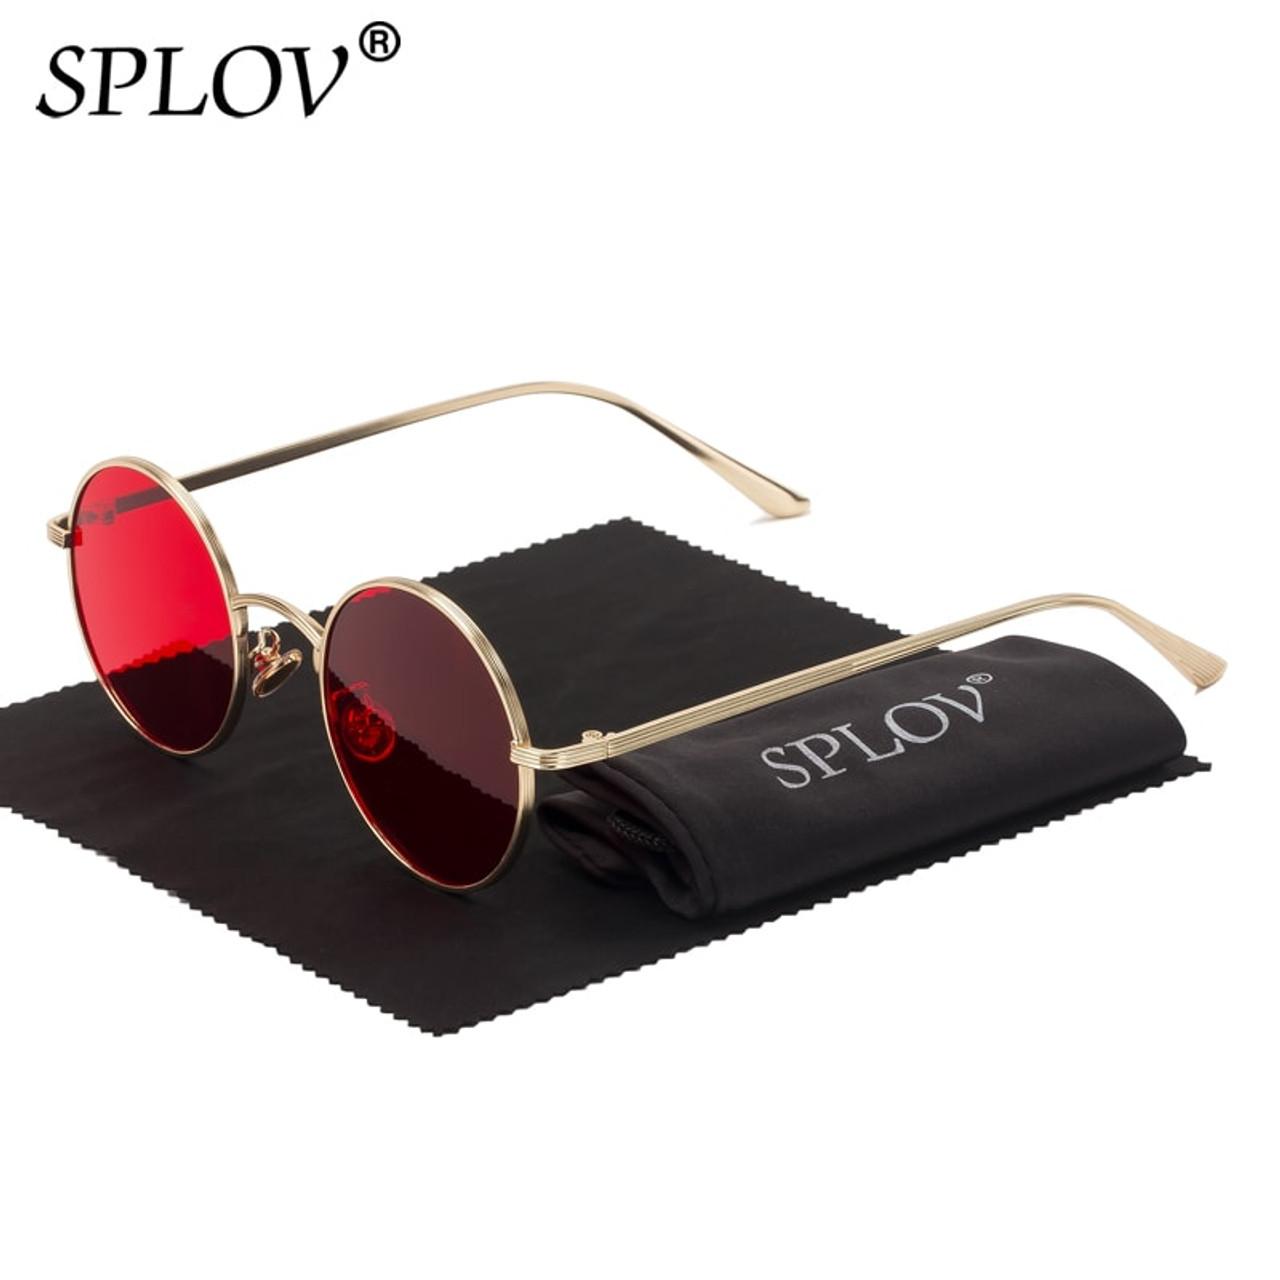 Splov Vintage Men Sunglasses Women Retro Punk Style Round Metal Frame Colorful Lens Sun Glasses Fashion Eyewear Gafas Sol Mujer Onshopdeals Com